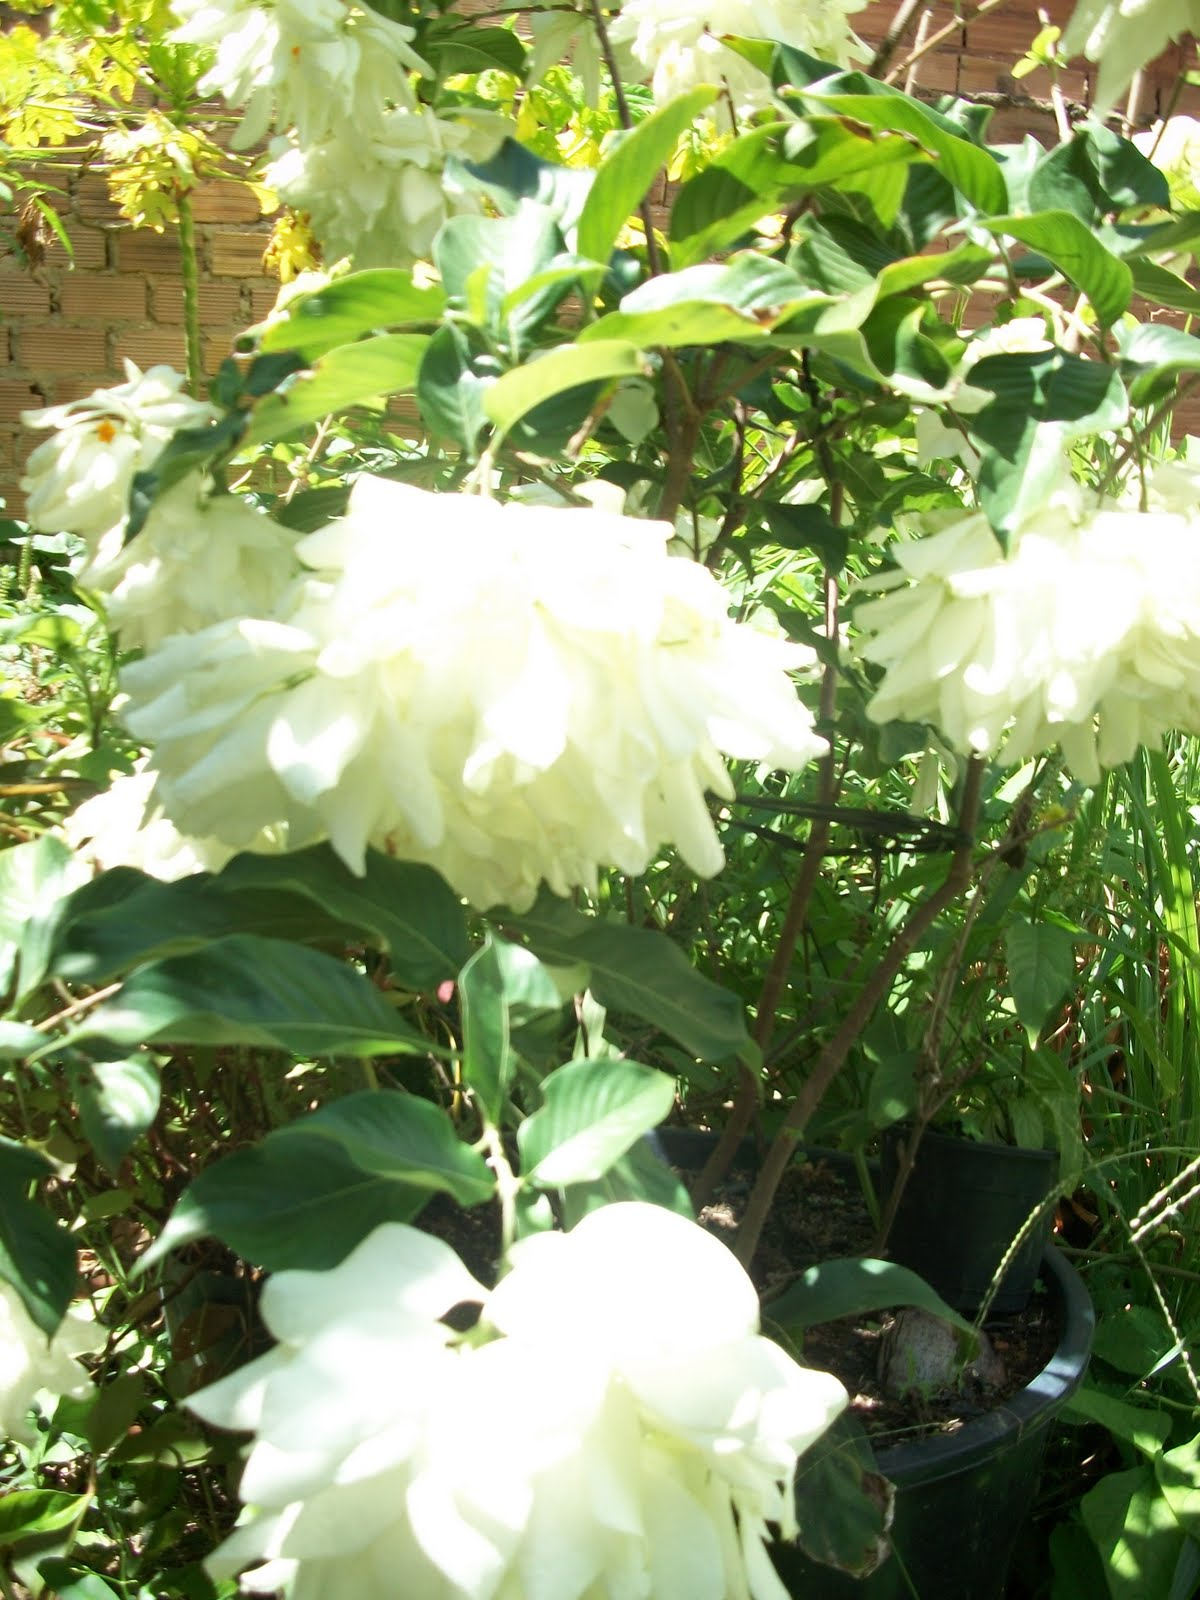 flores no jardim de deus : flores no jardim de deus:Casa Das Plantas Jardim de Deus